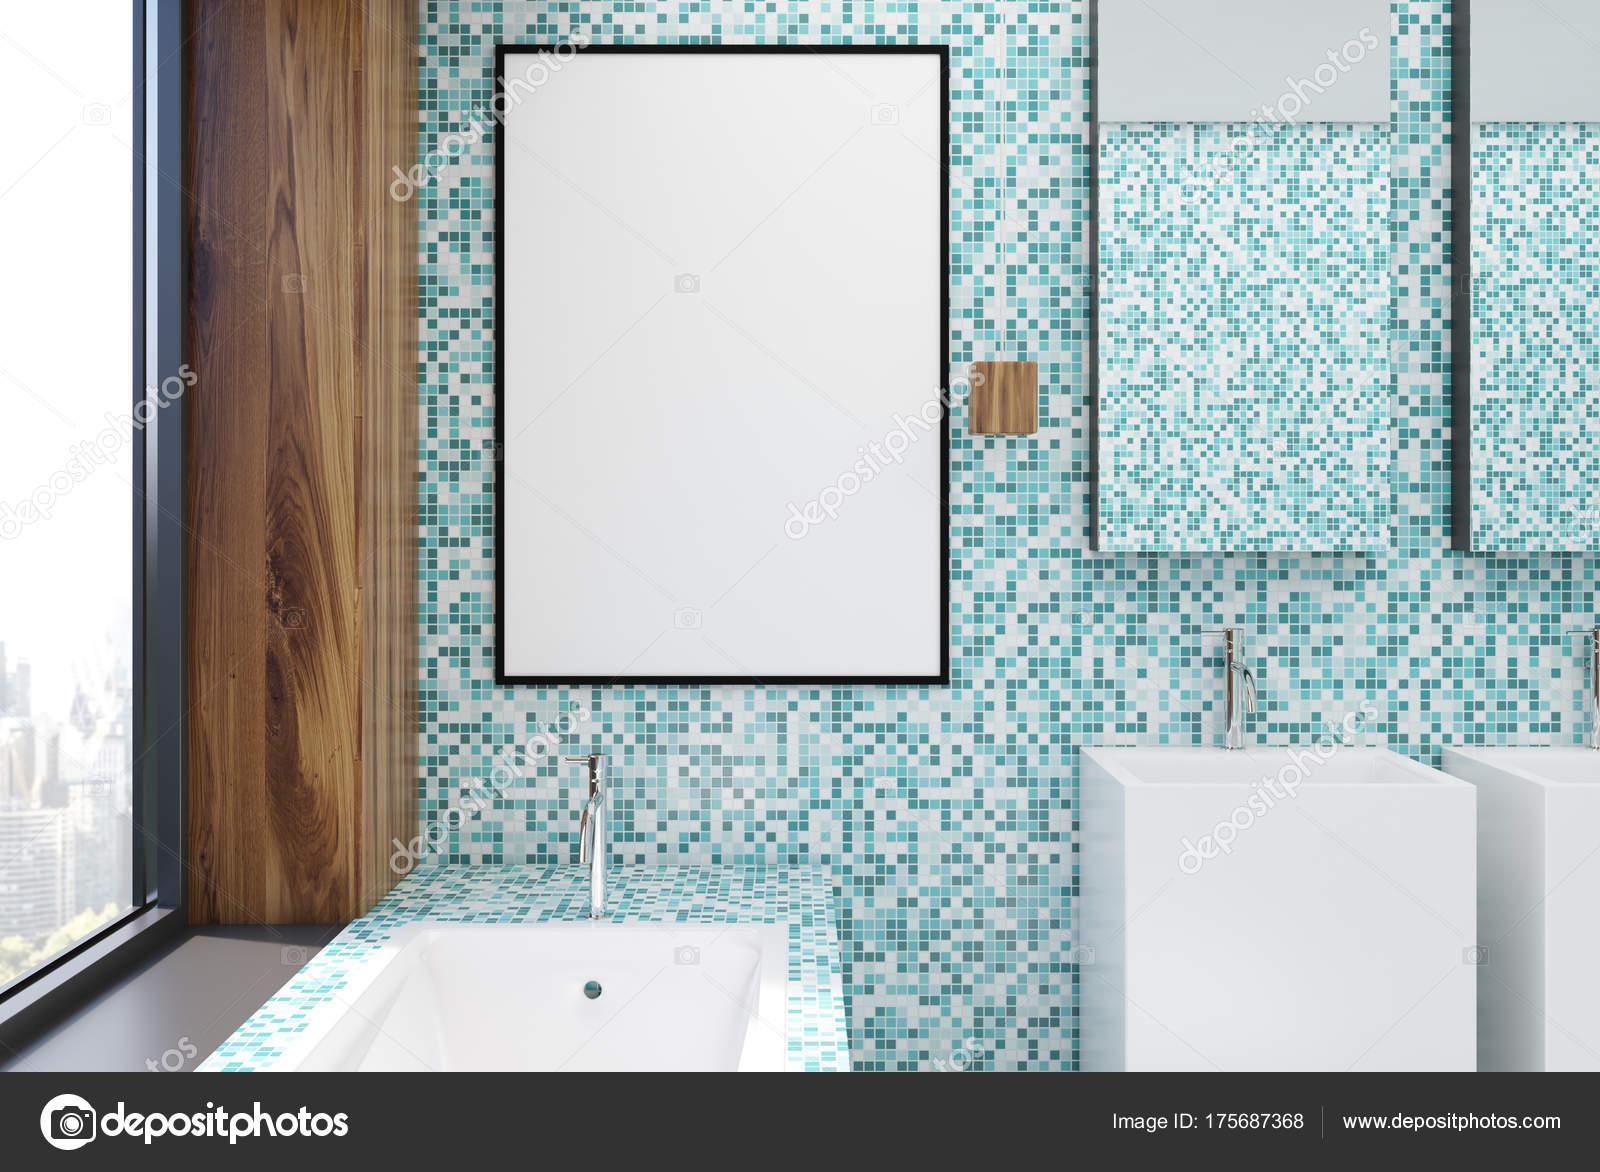 Blaue Fliesen Badezimmer Interieur, Plakat — Stockfoto ...